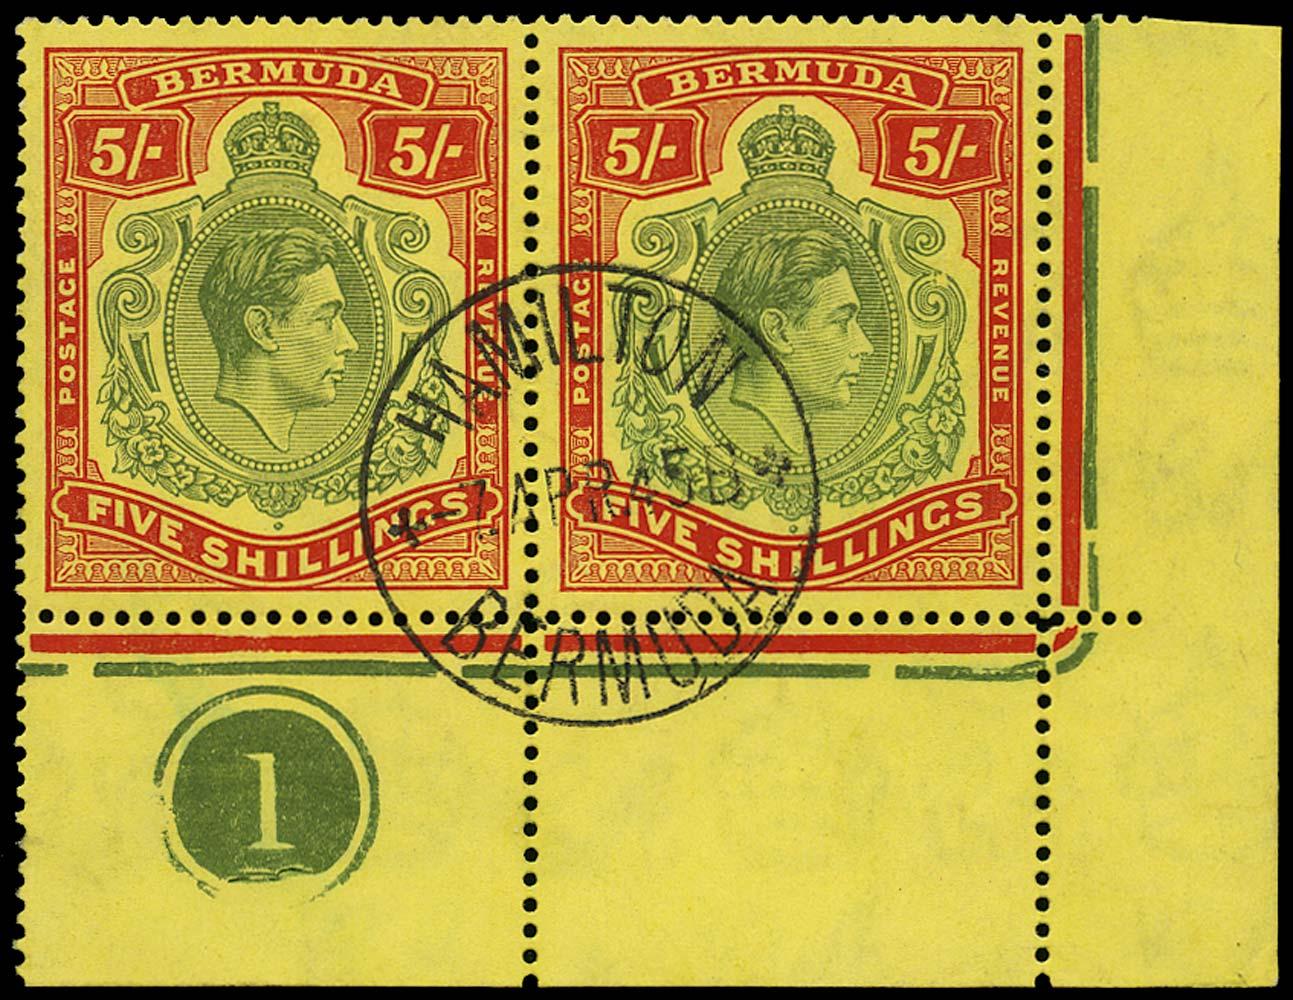 BERMUDA 1941  SG118bd/e Used